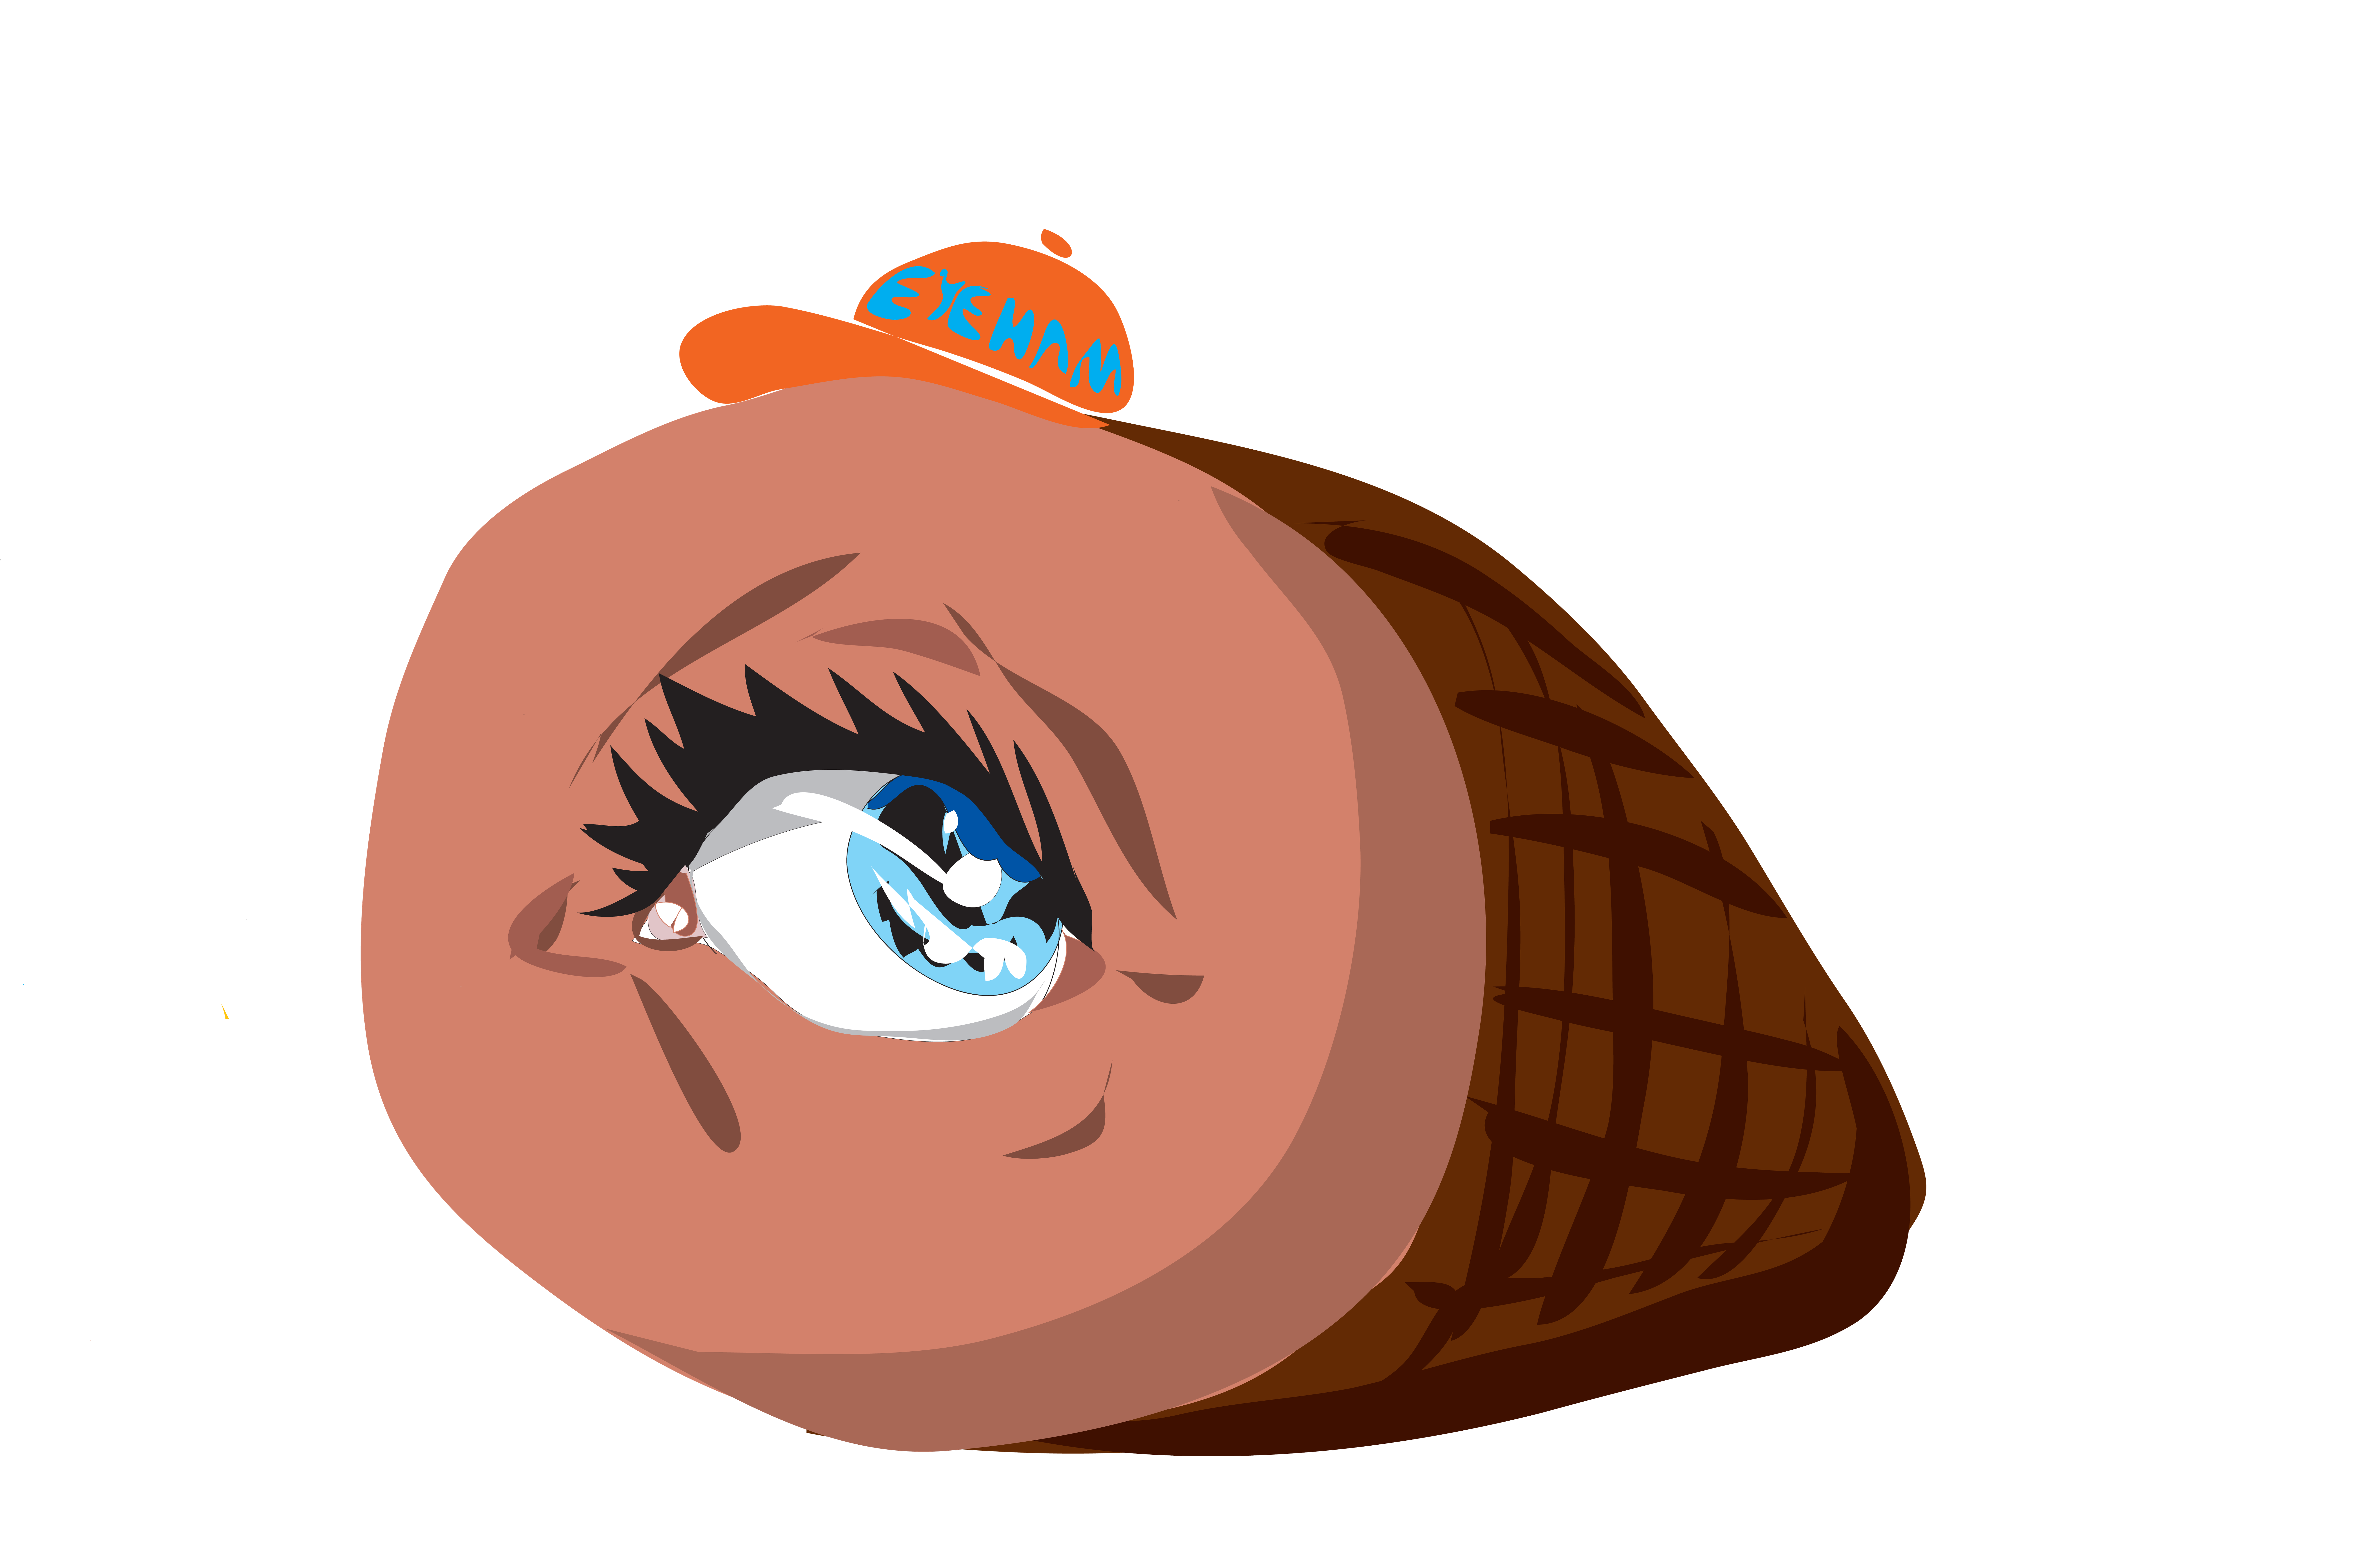 Ham clipart vector. Sam eye logo by